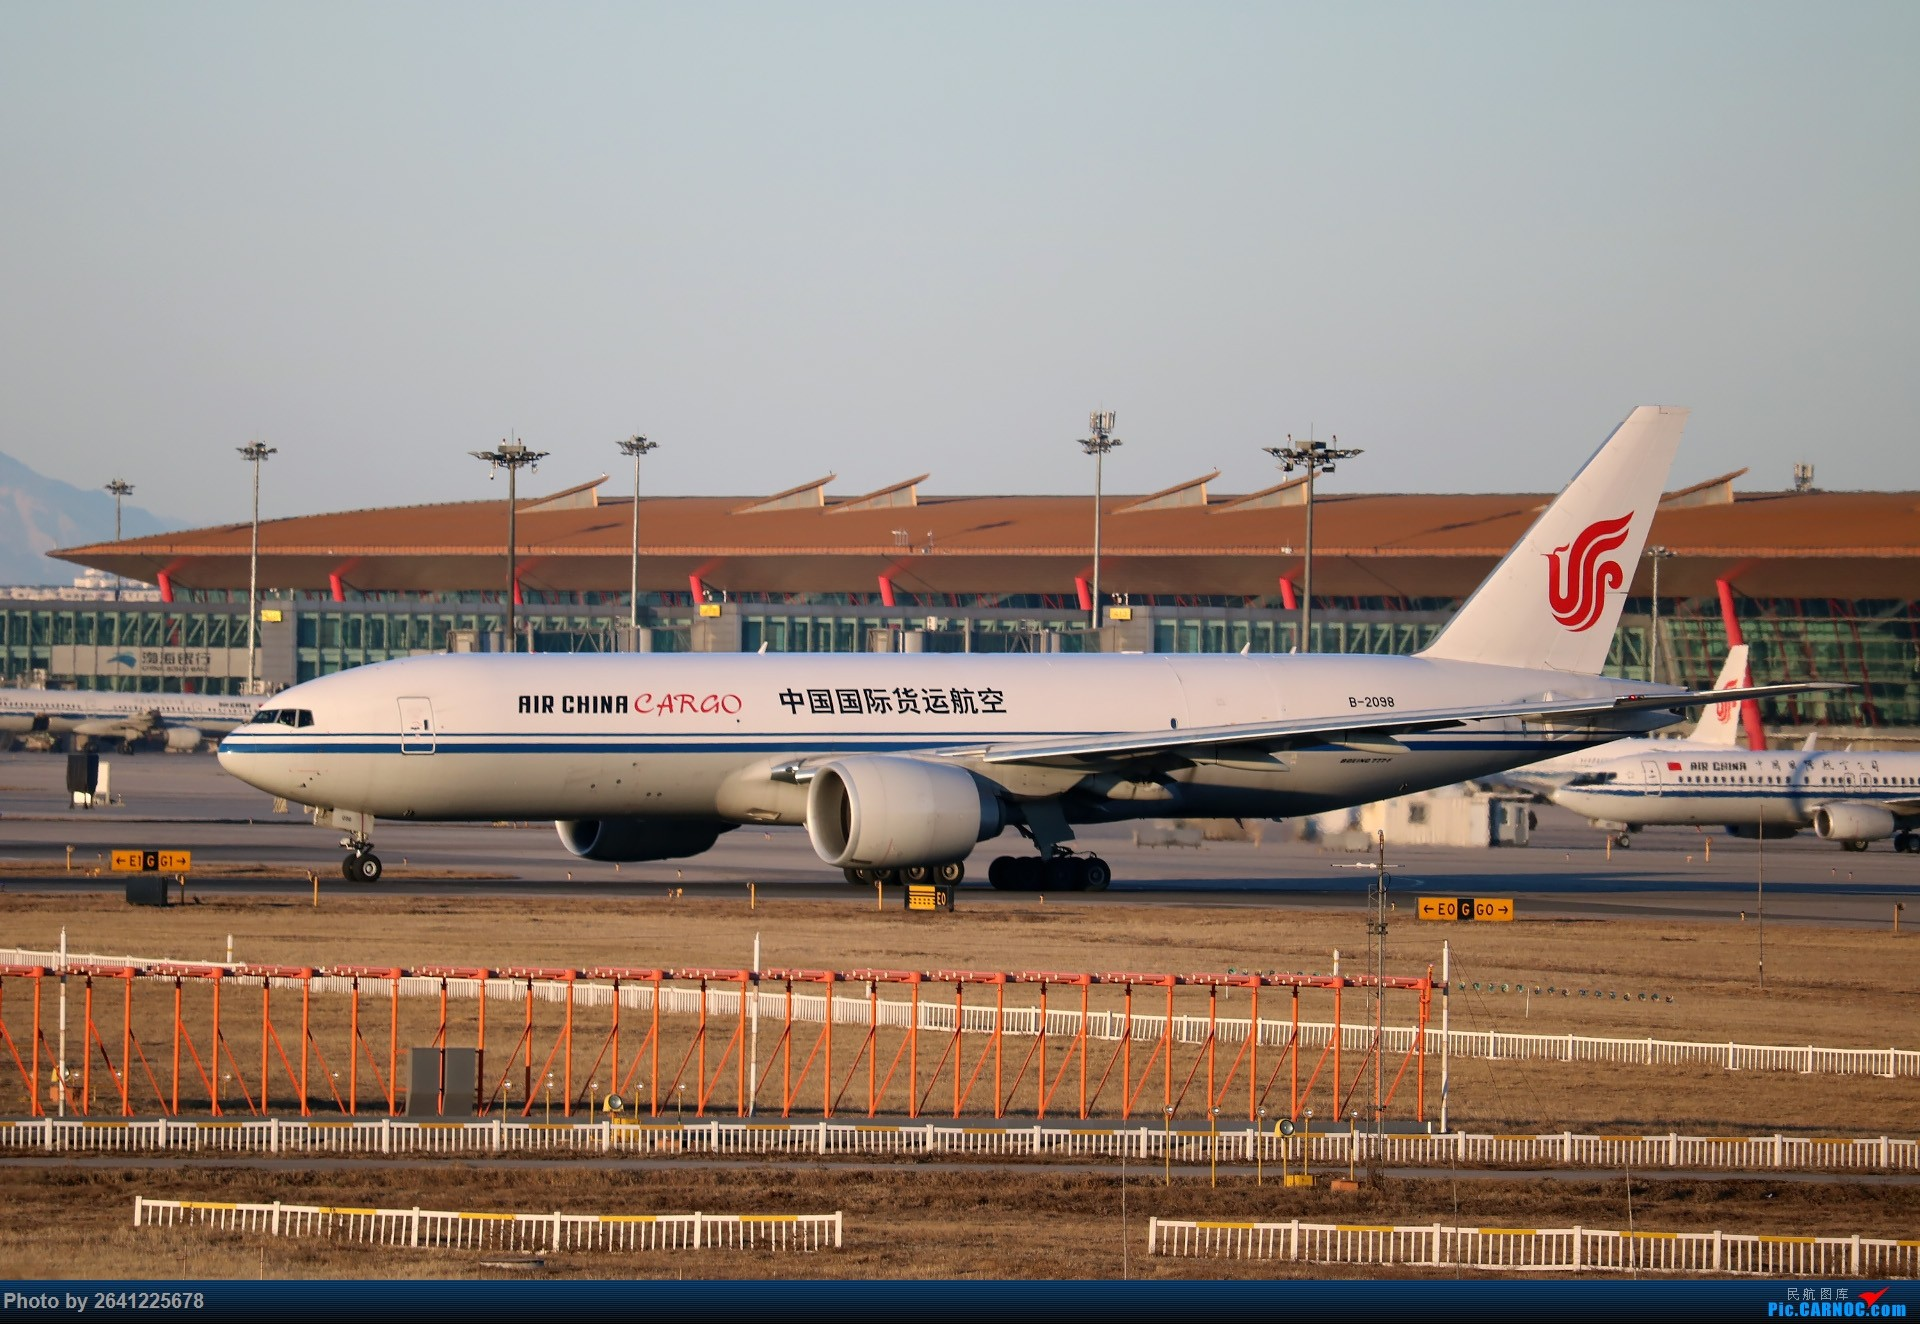 Re:[原创]没事儿修个图 BOEING 777-200 B-2098 中国北京首都国际机场